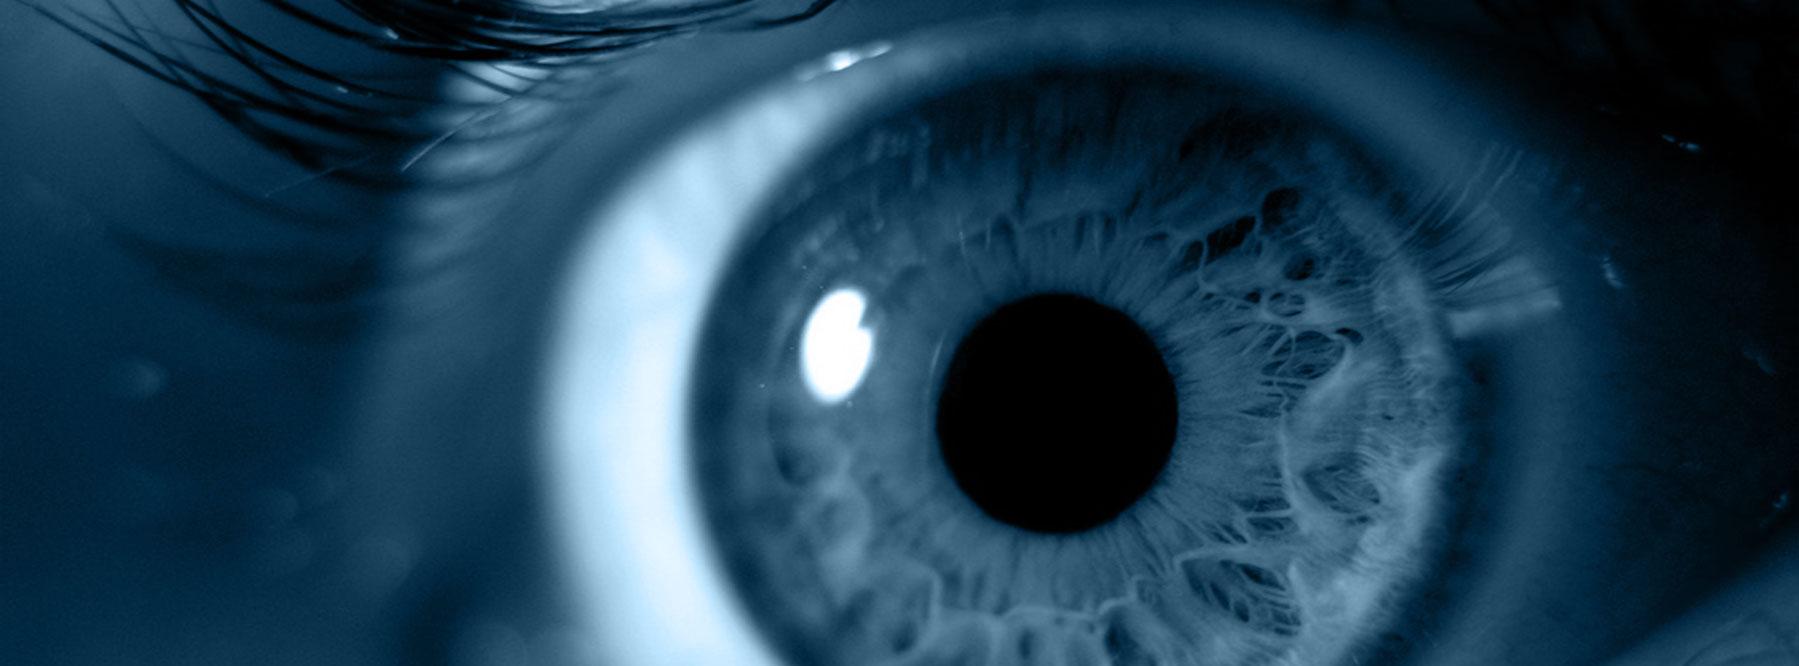 Retinal Detachment | Randall Wong, M.D., Retina Specialist, Fairfax, Virginia, 22031